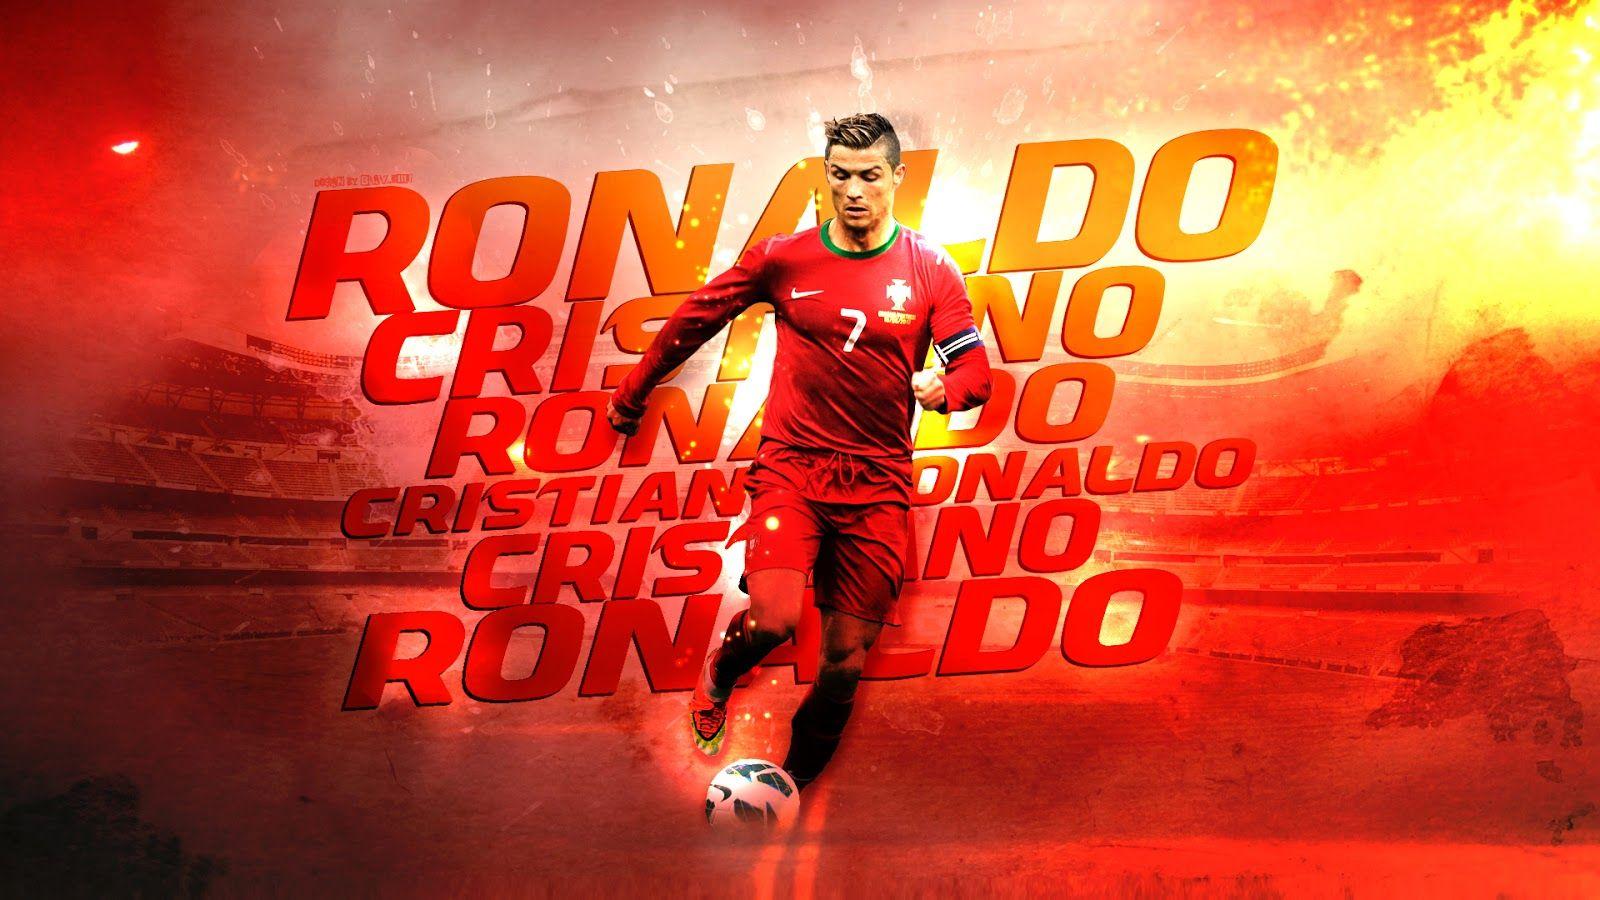 cristiano ronaldo wallpaper 2014 brazil CR7 Best Home